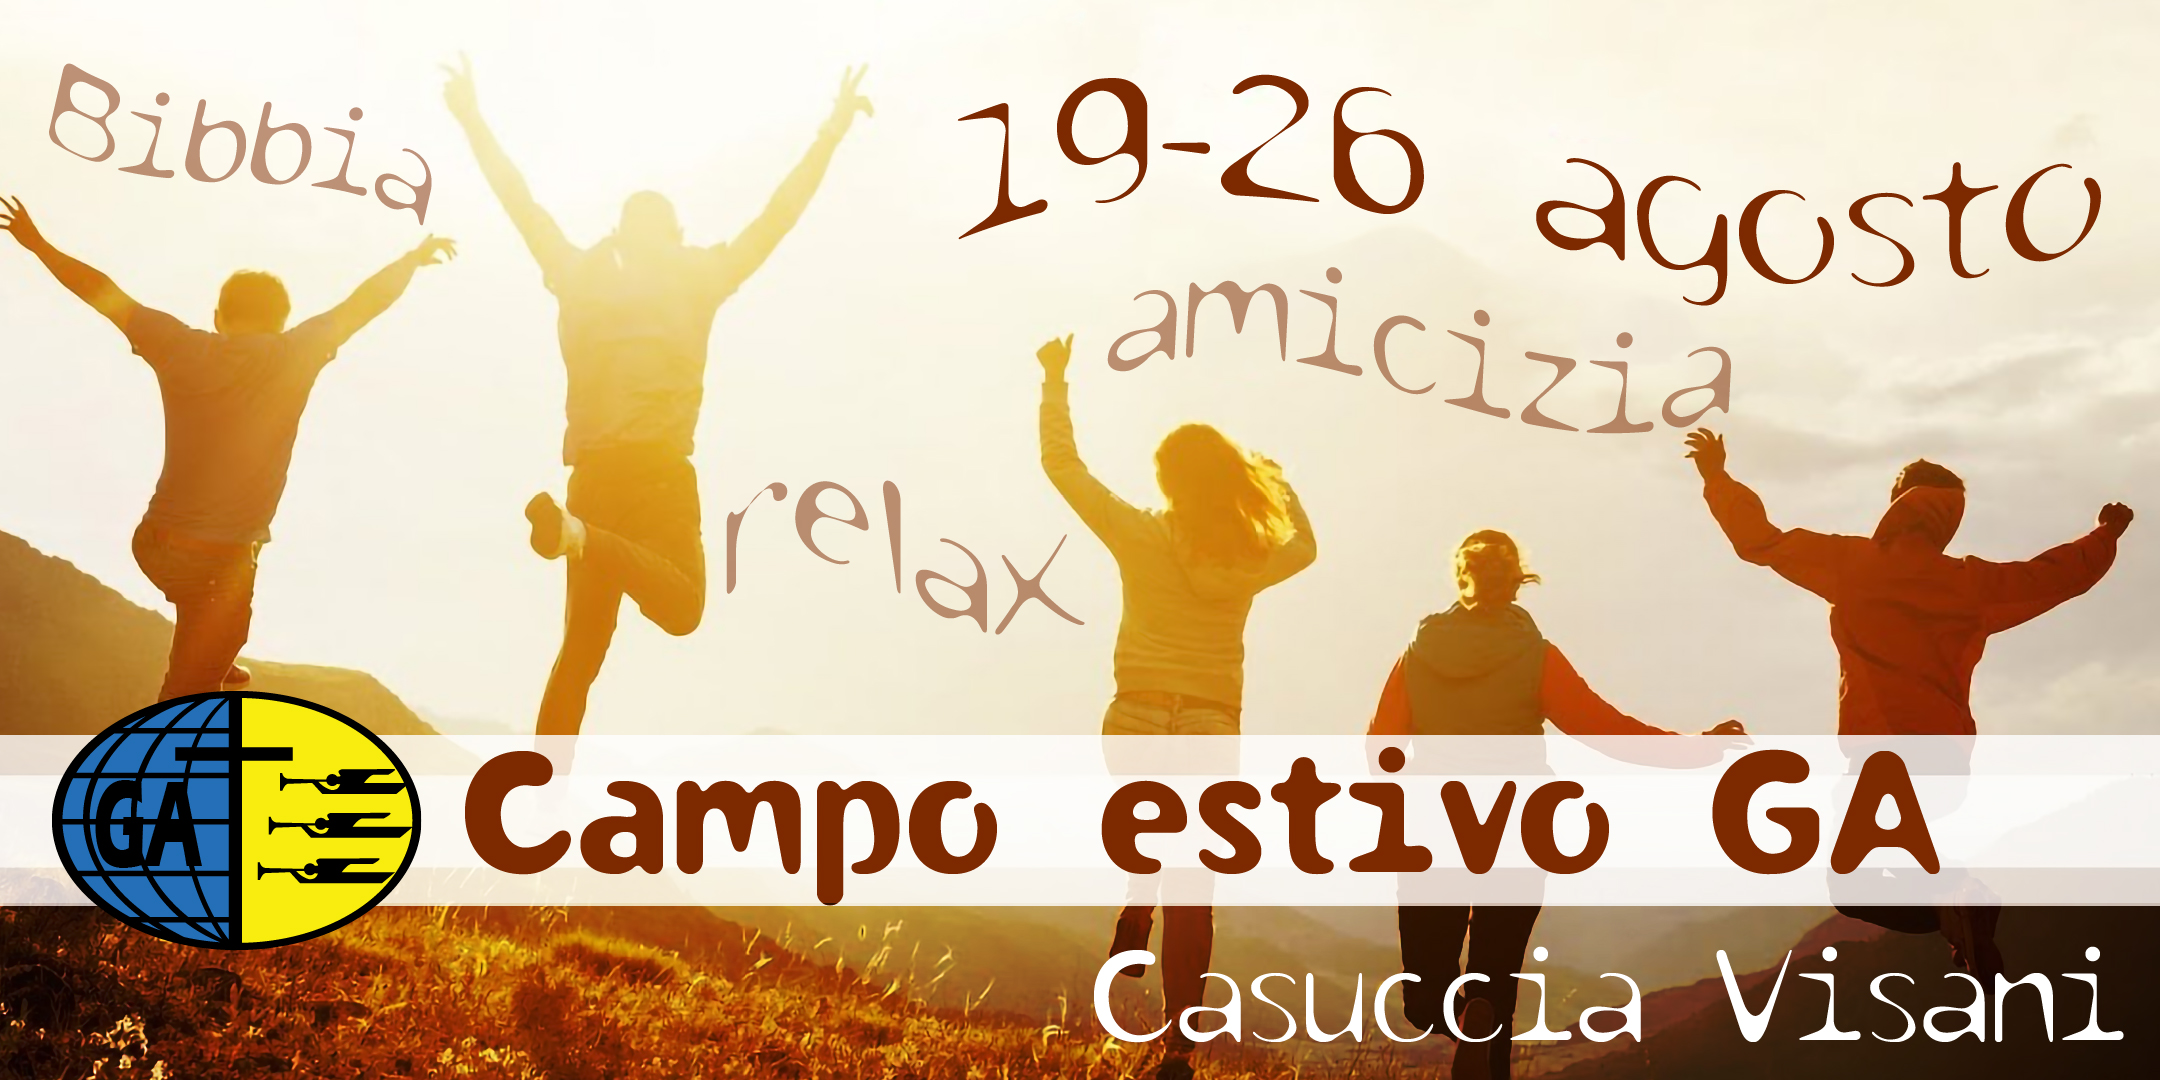 Campo GA Casuccia Visani 2018